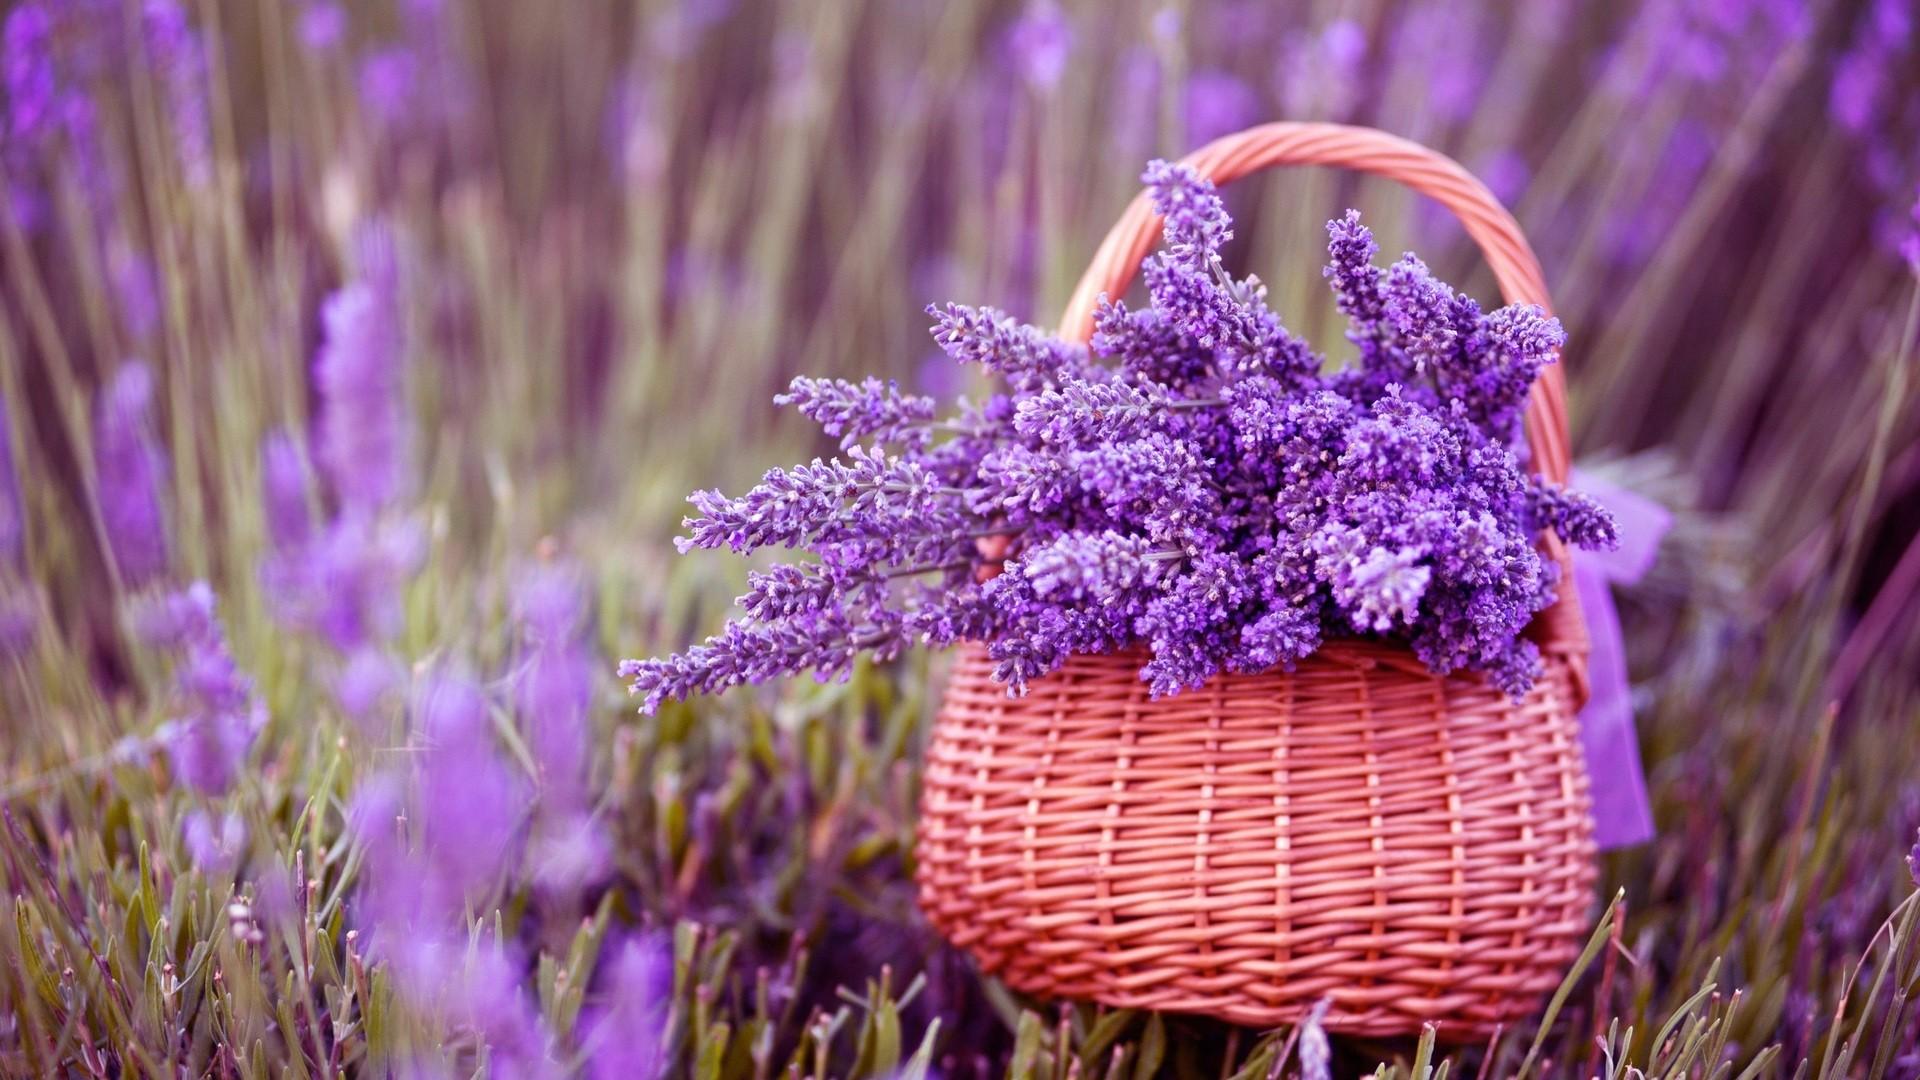 Lavender Wallpaper image hd